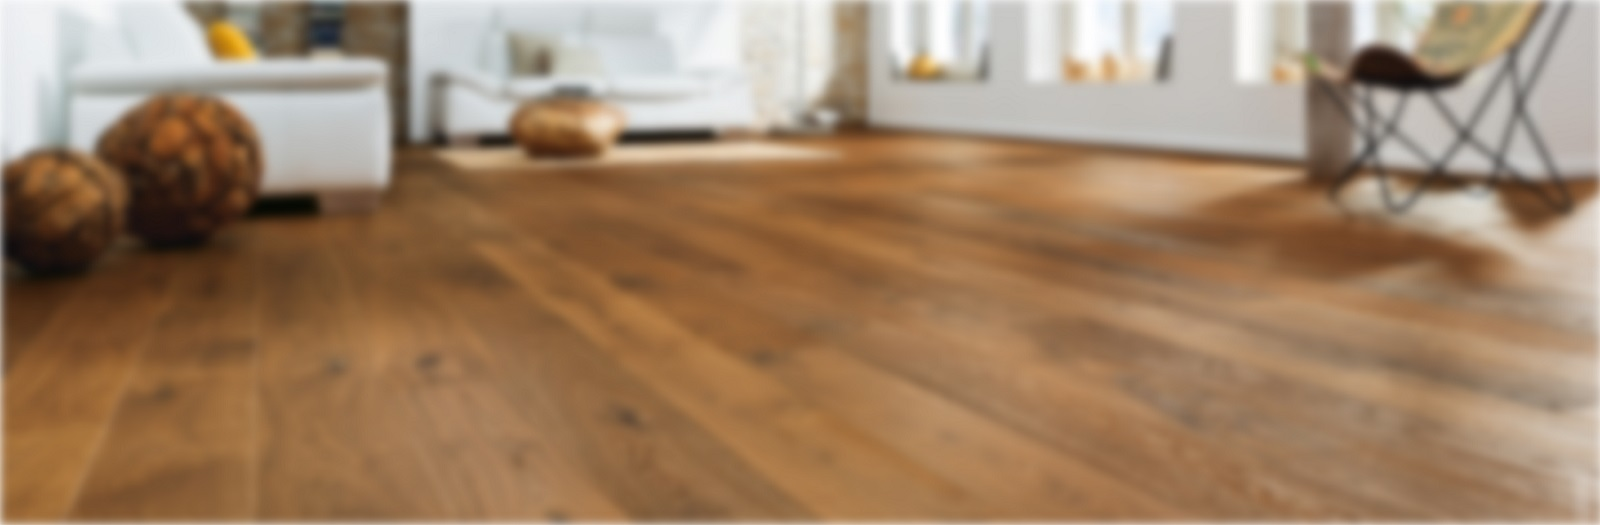 Fabricantes parquet maderea - Tipos de suelo para casa ...